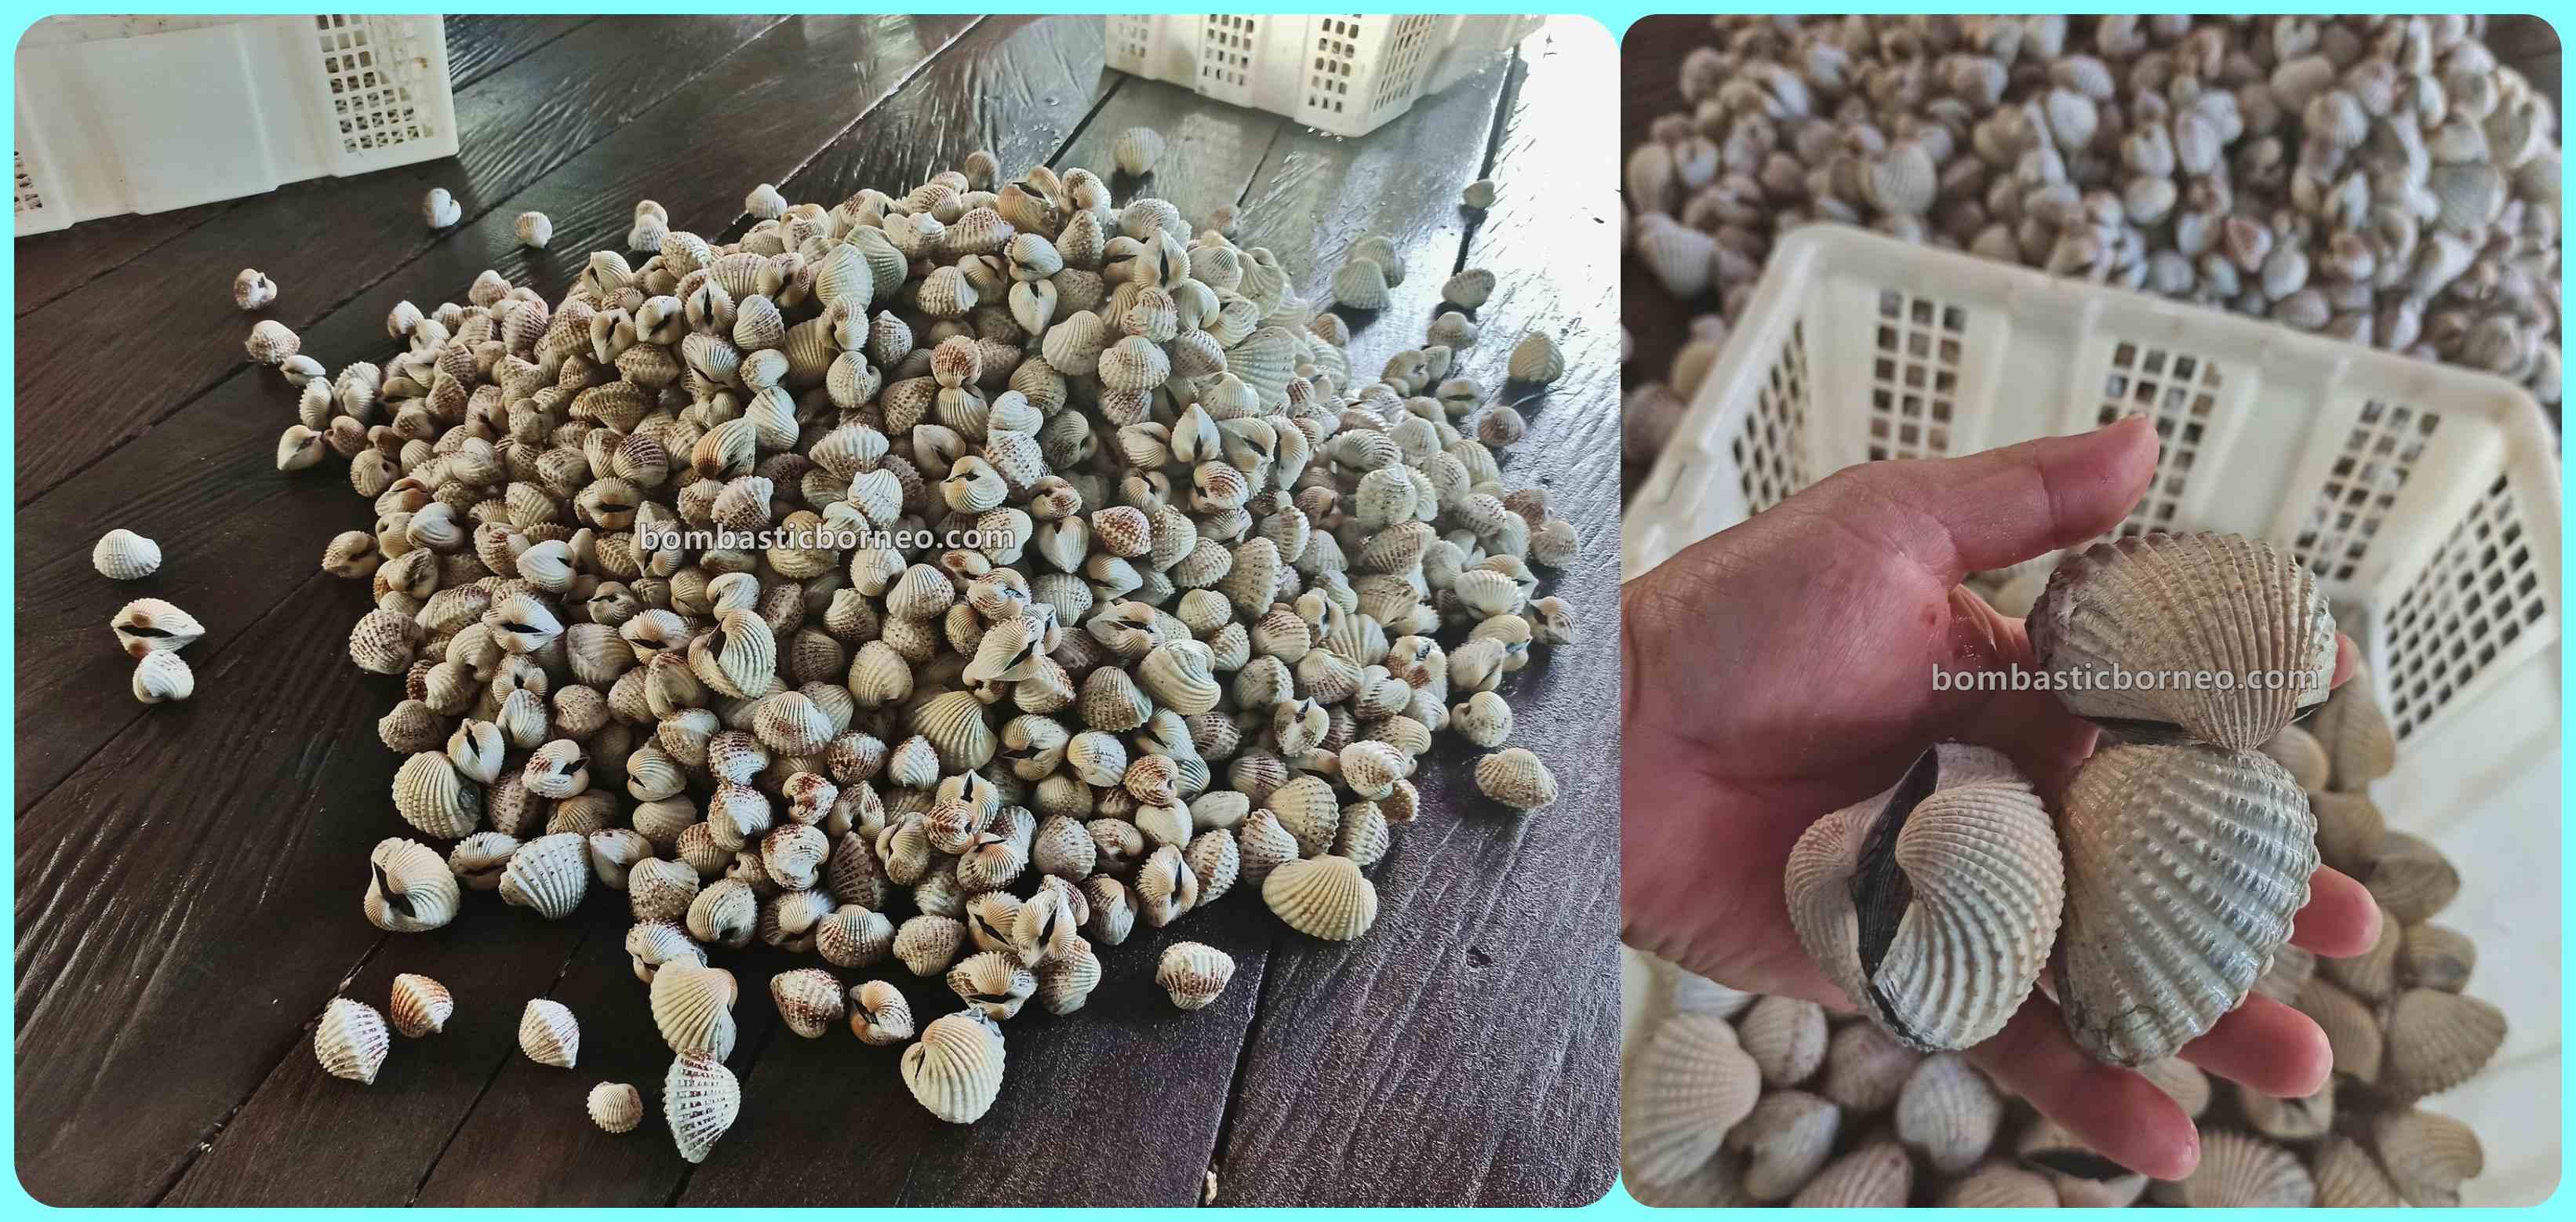 Kepiting Soka, Soft Shell Crab Farm, destination, Exotic Delicacy, exploration, Kaltara, Pariwisata, Tourism, Cross Border, Borneo, 印尼北加里曼丹, 打拉根岛鸟蛤养殖场